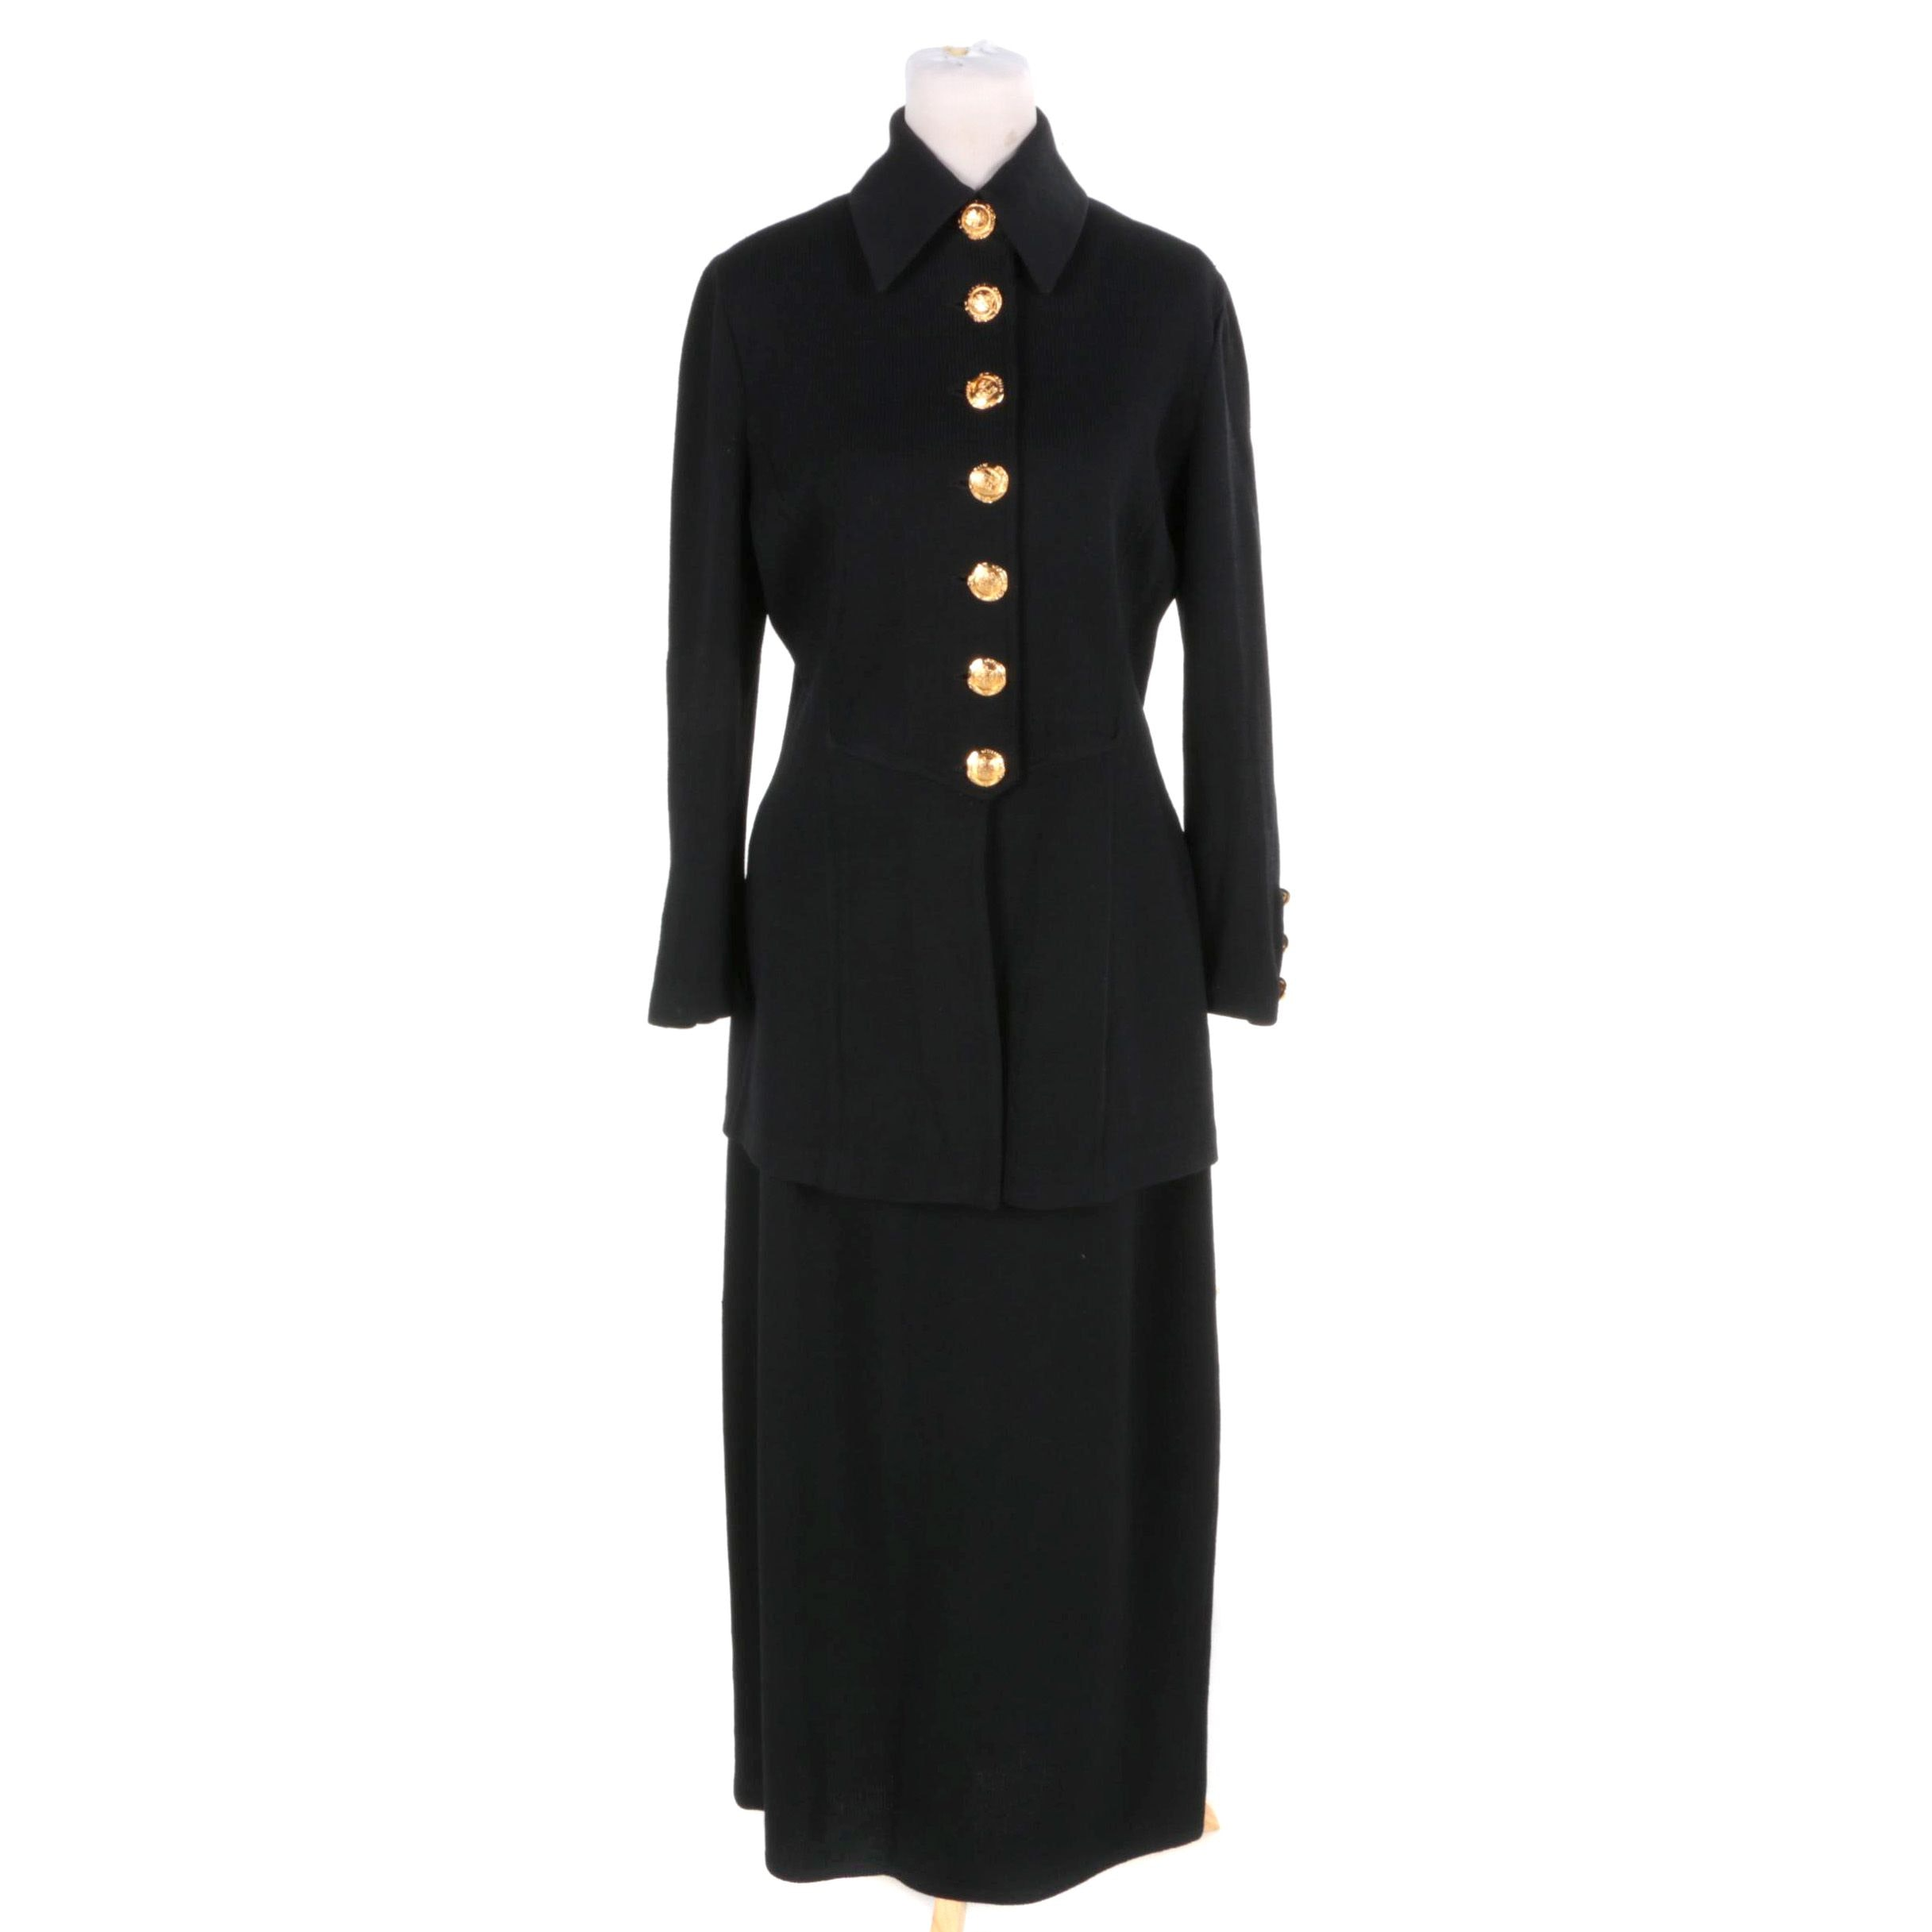 St. John Brand Knit Jacket and Skirt